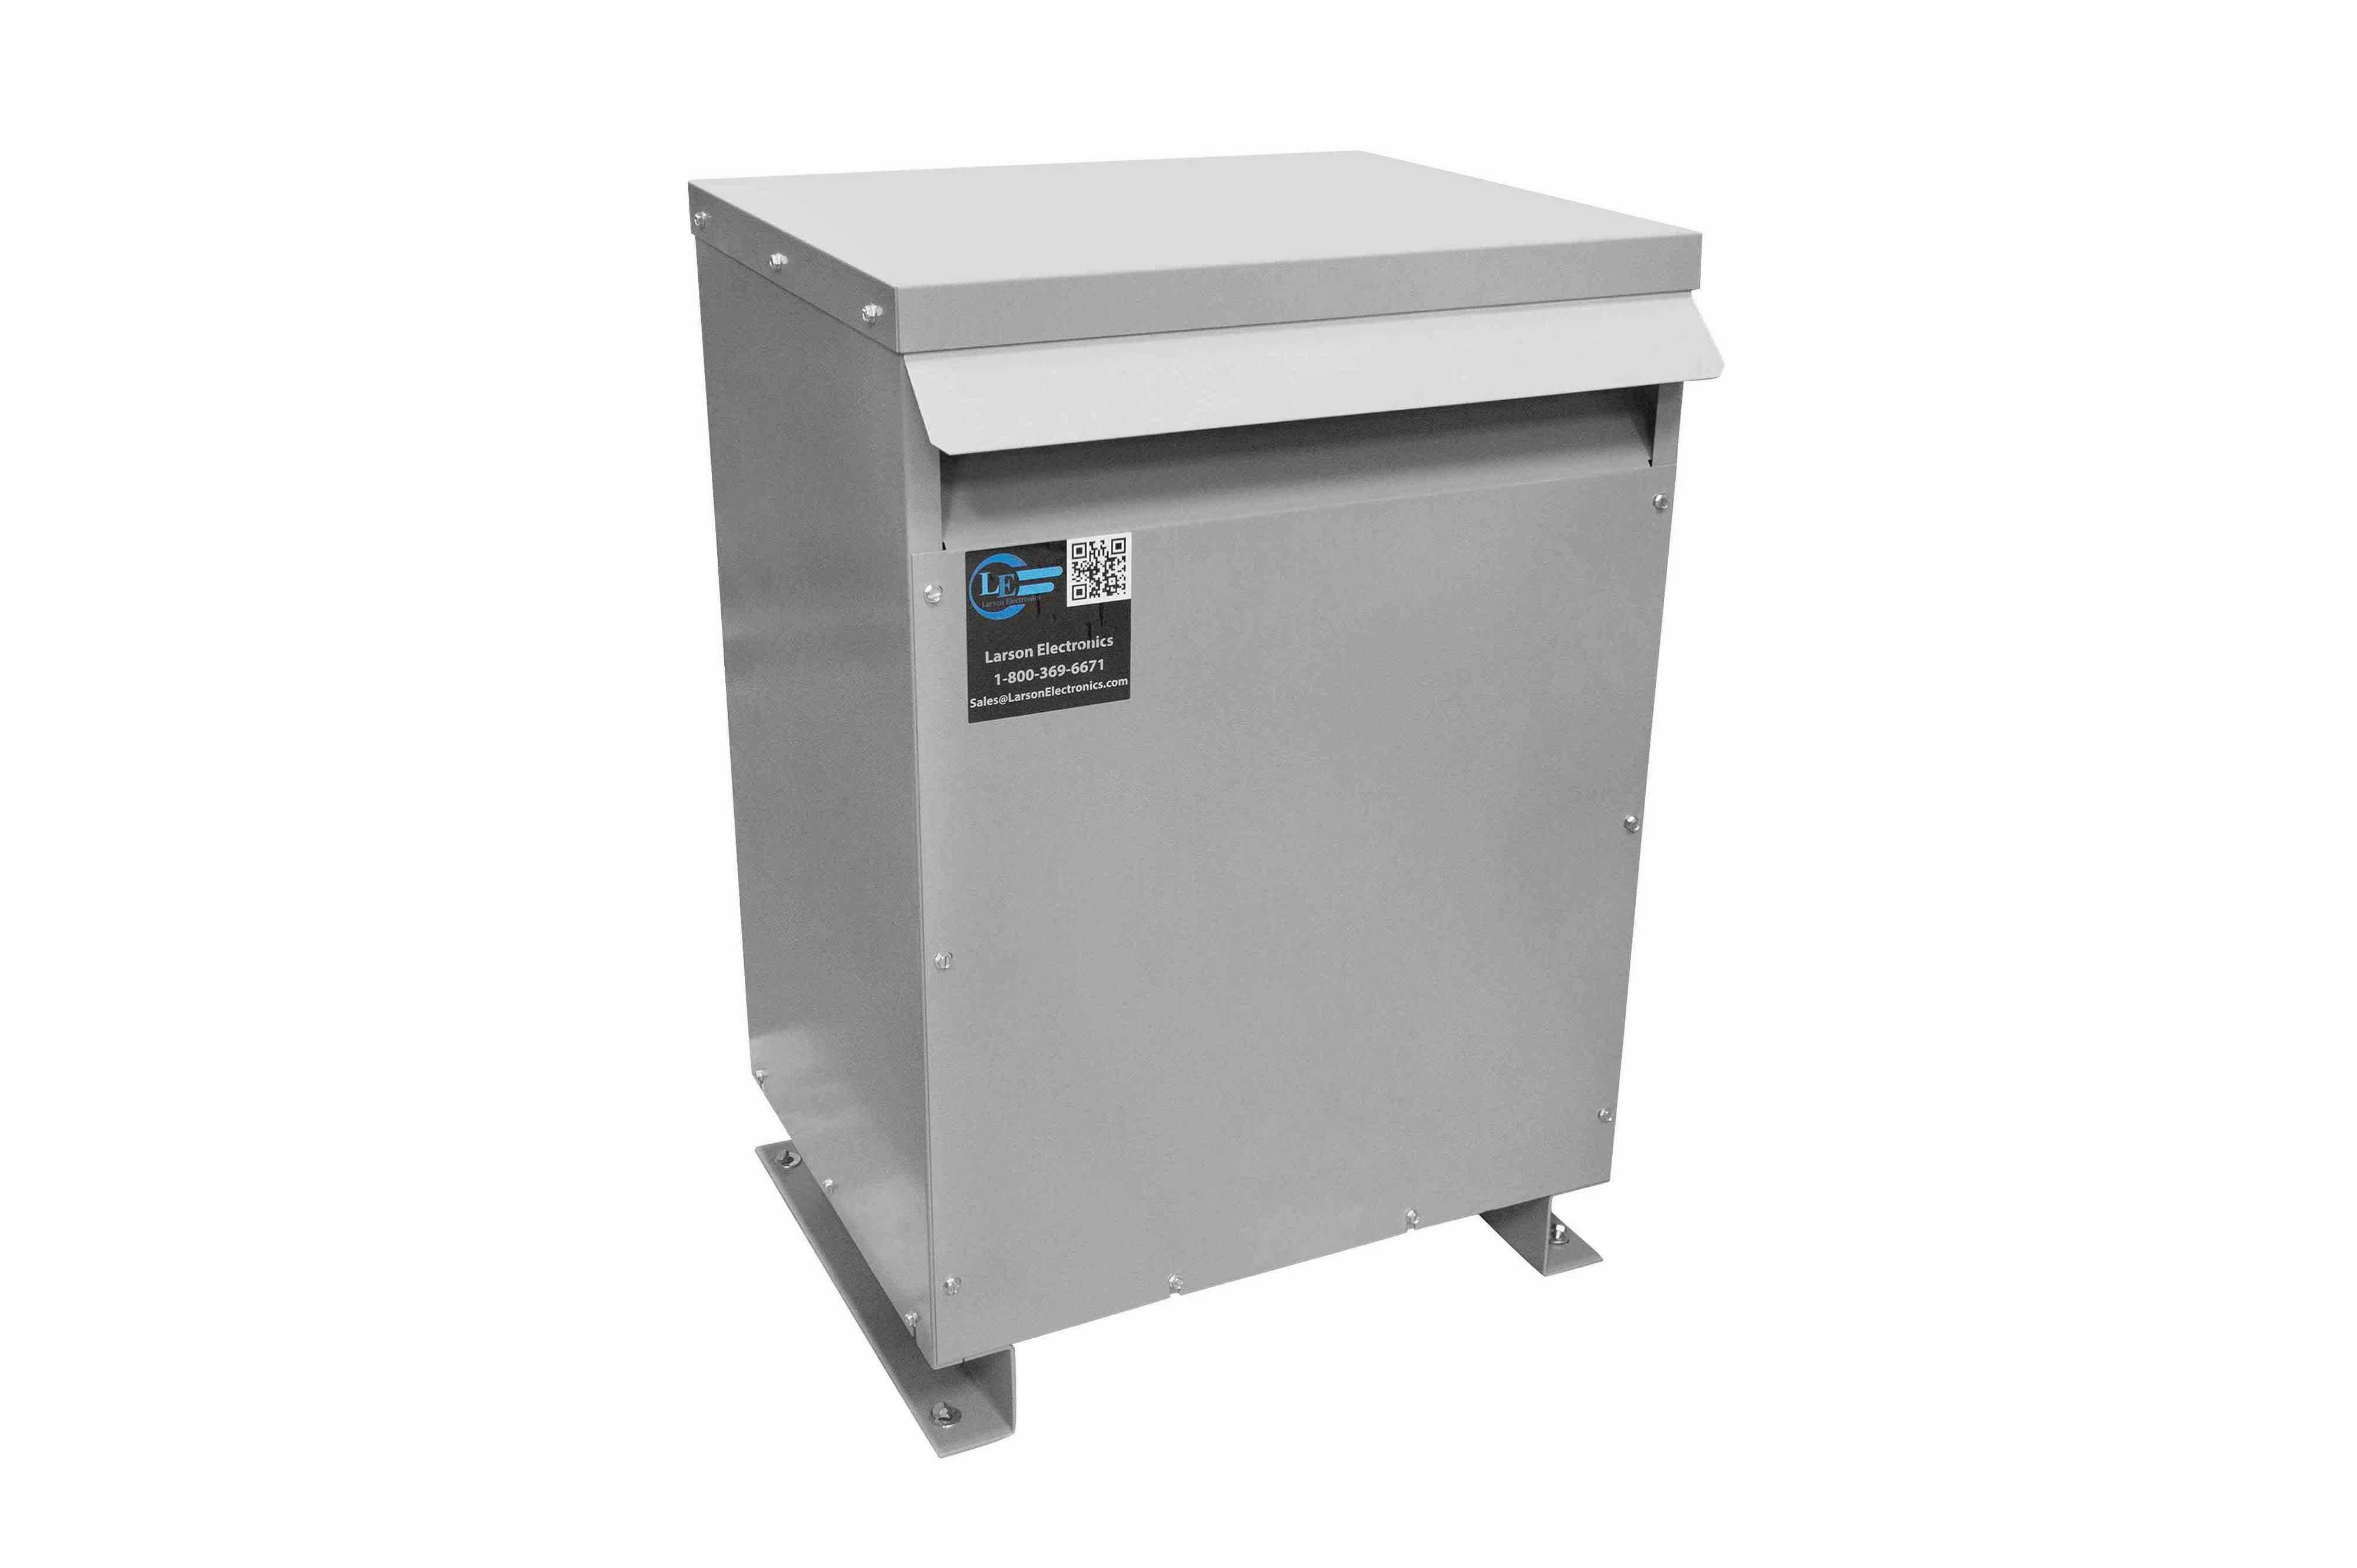 150 kVA 3PH Isolation Transformer, 208V Wye Primary, 600V Delta Secondary, N3R, Ventilated, 60 Hz